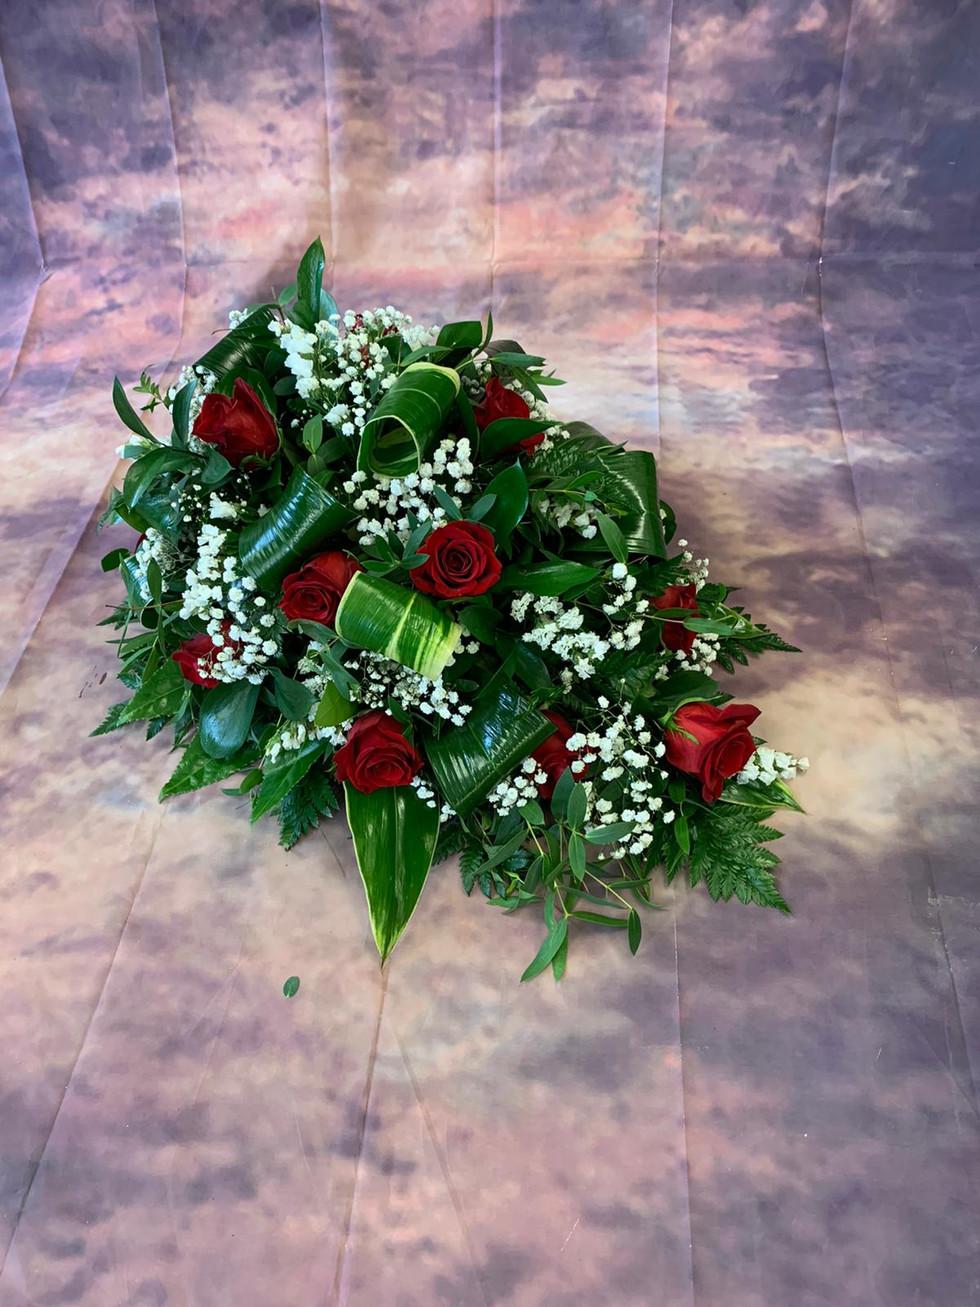 Single Ended Red Rose Coffin Spray Funeral Flower Tribute.jpg